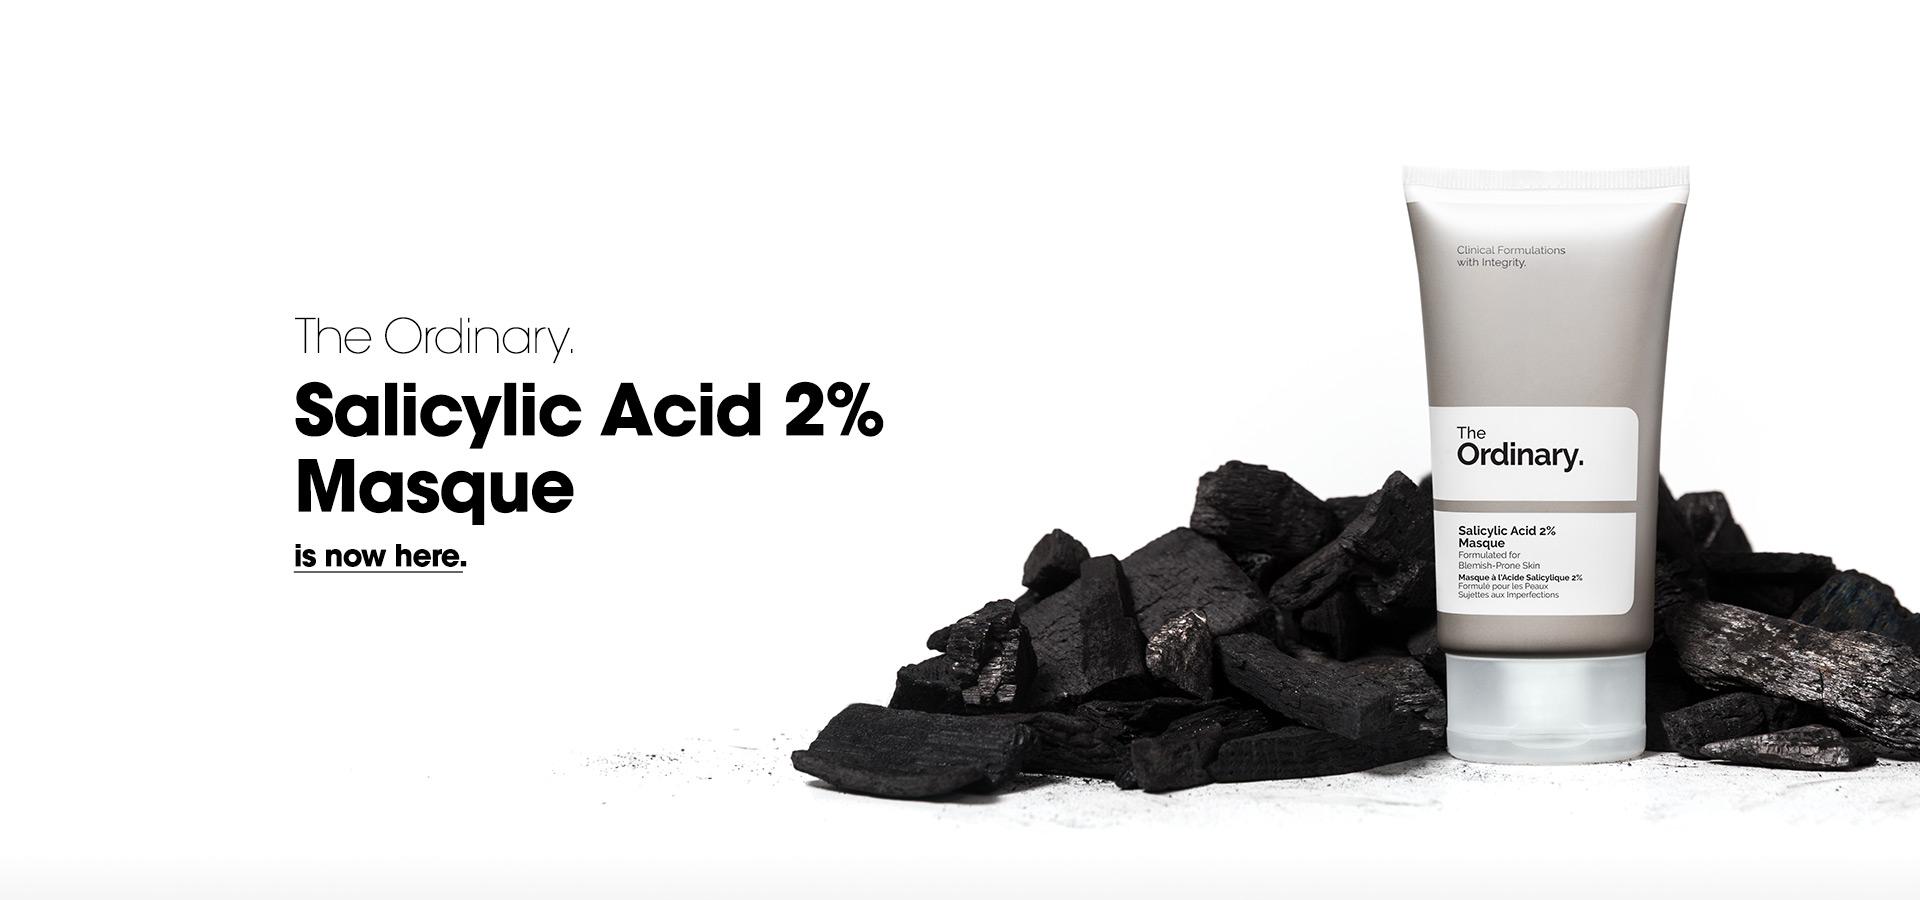 Deciem旗下品牌The Ordinary直接以成分及濃度作為產品名稱,如這是一款「含有2%濃度水楊酸的面膜」。